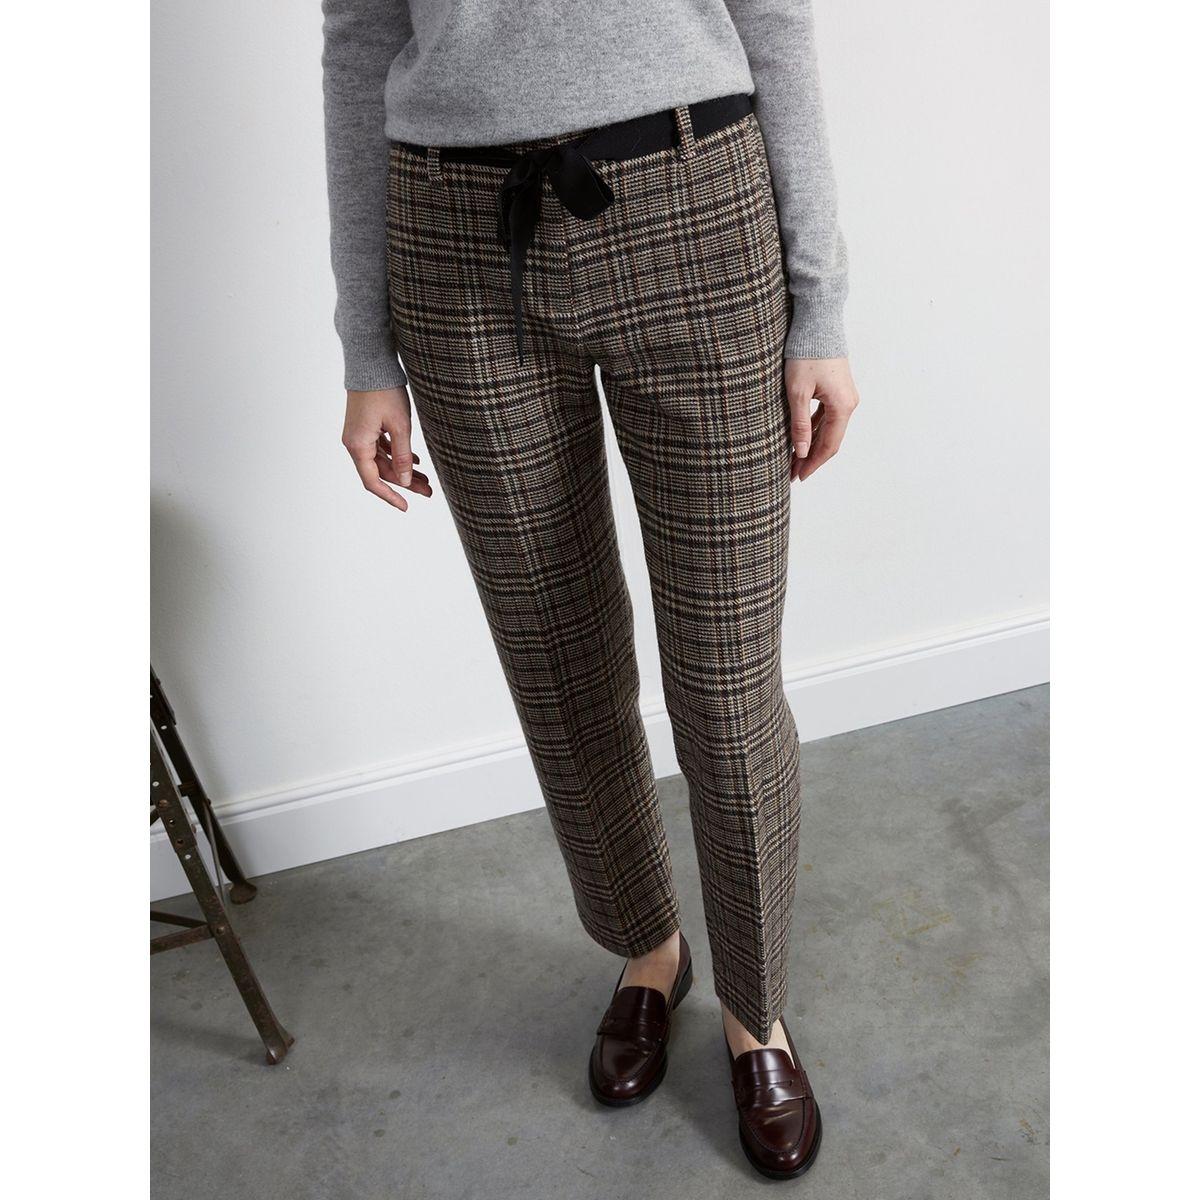 Pantalon carotte femme en lainage